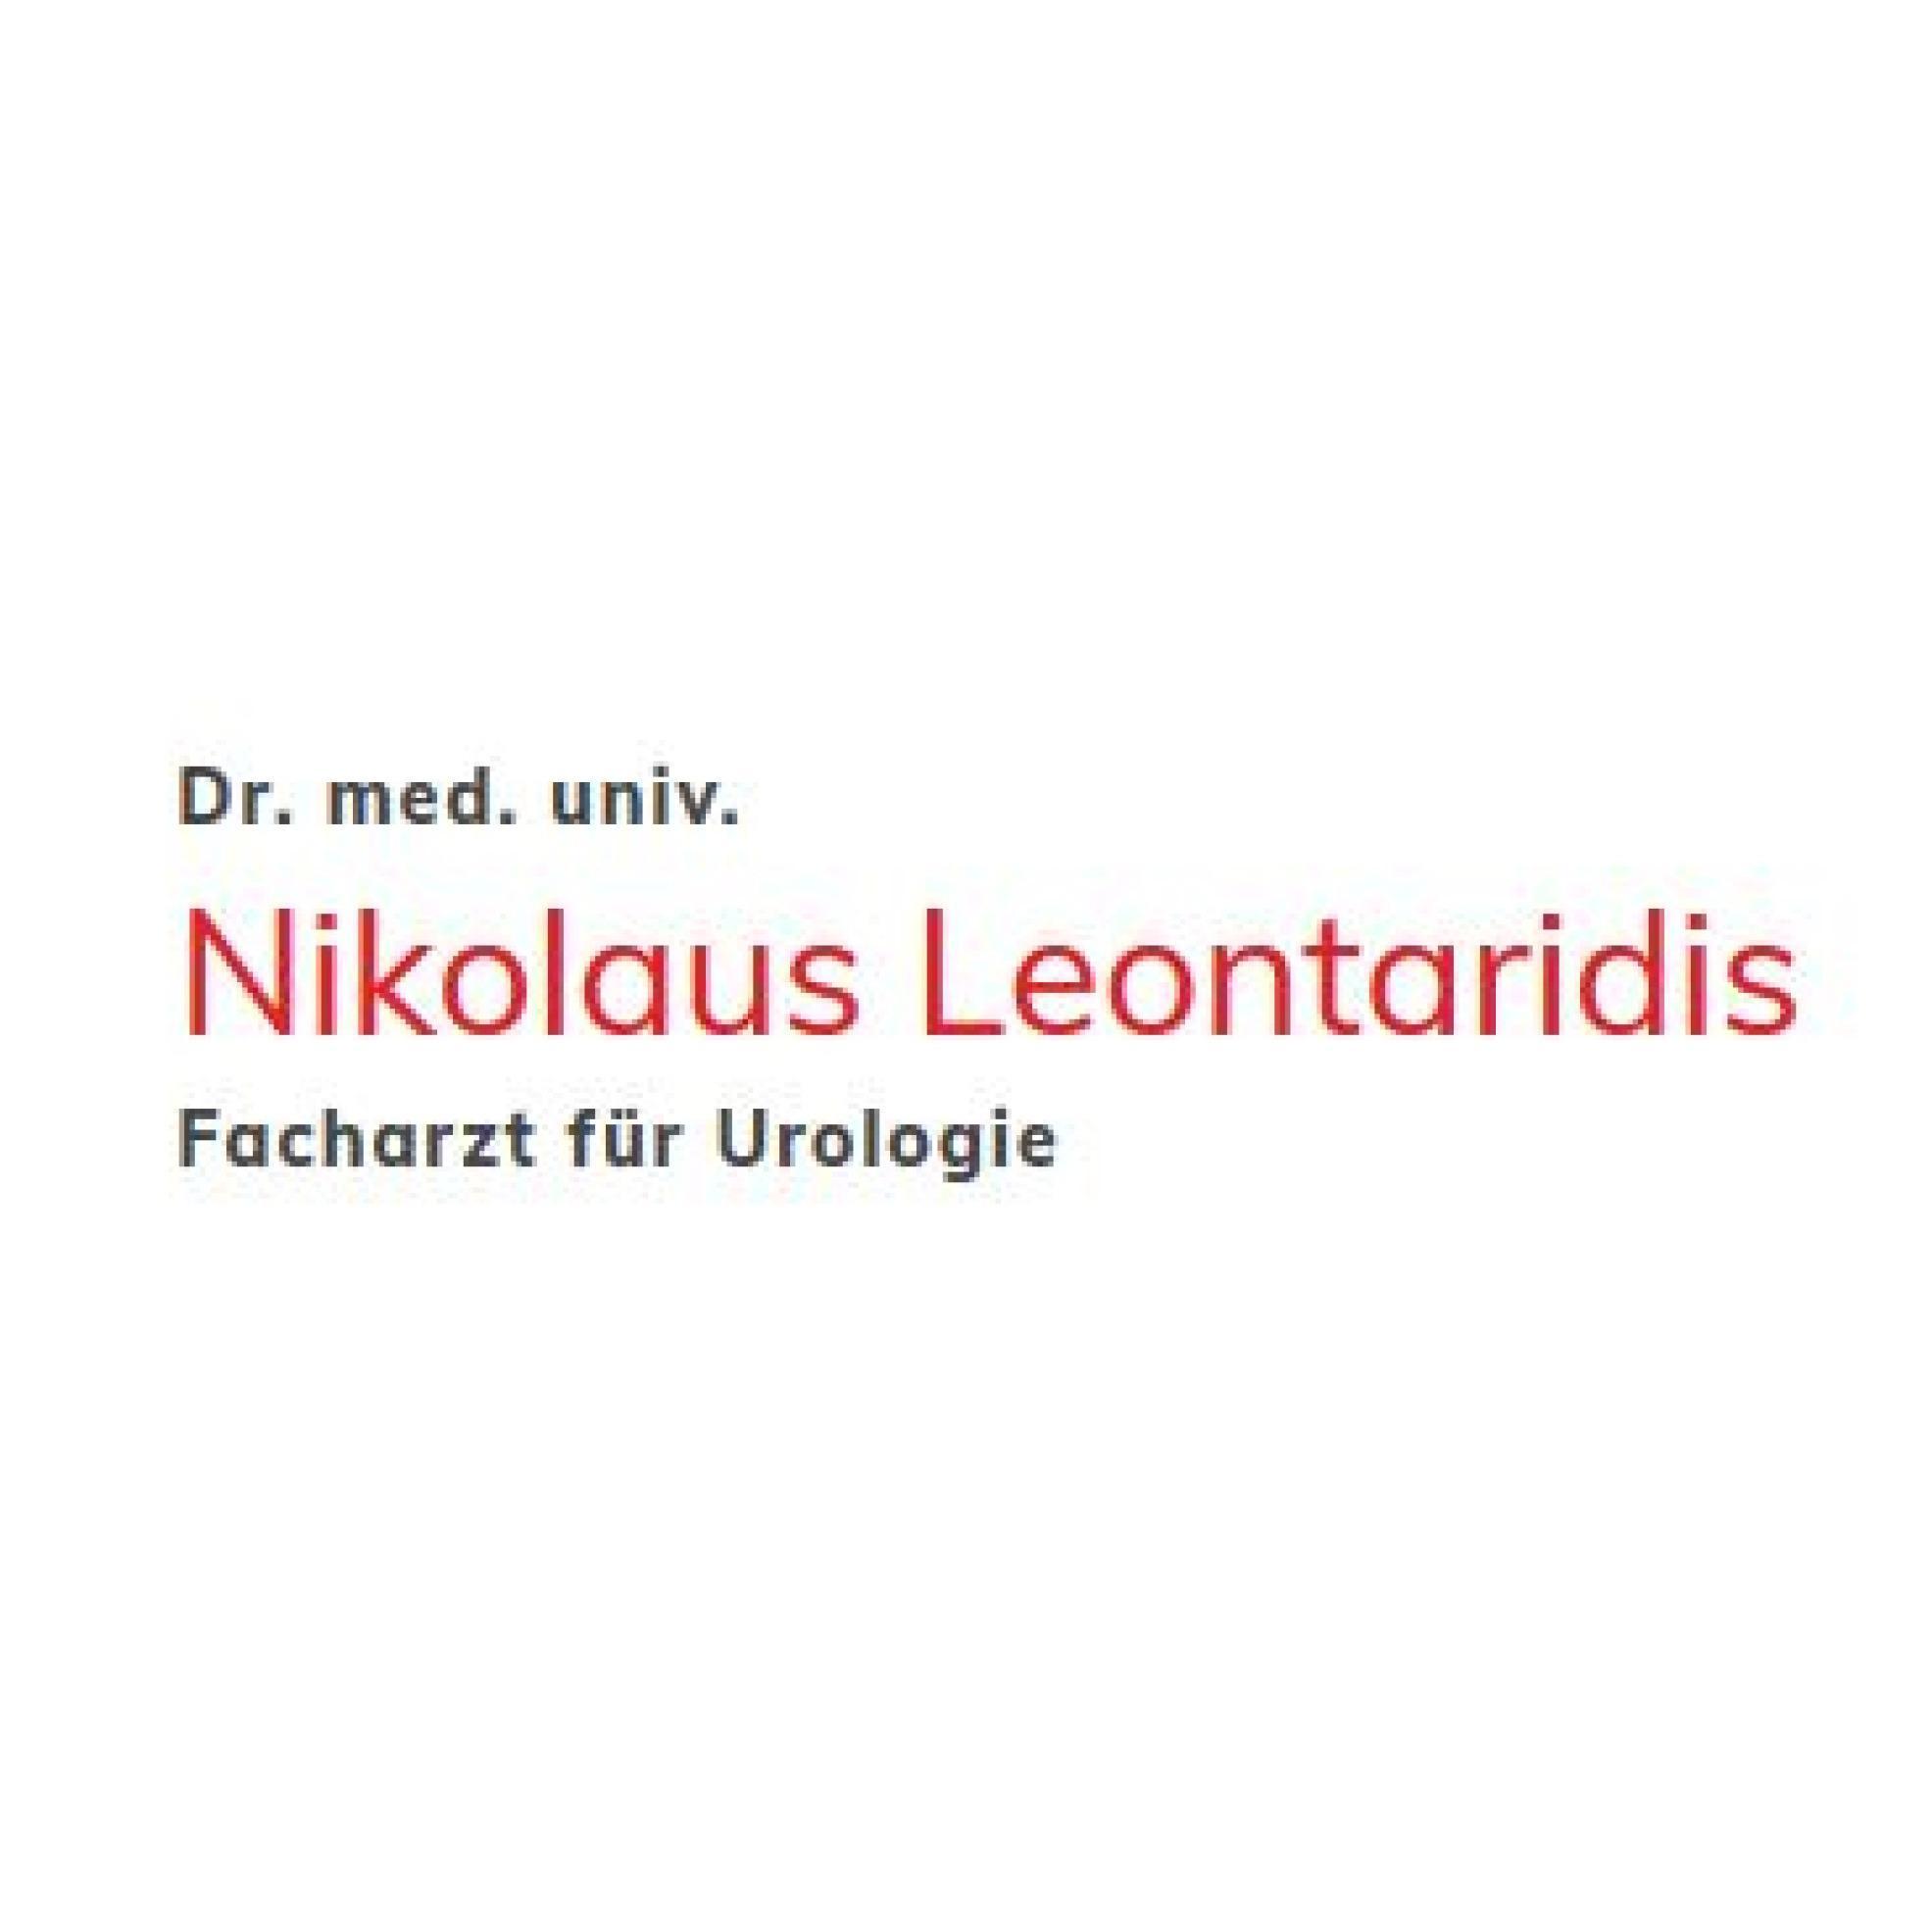 Dr. med. univ. Nikolaus Leontaridis Logo